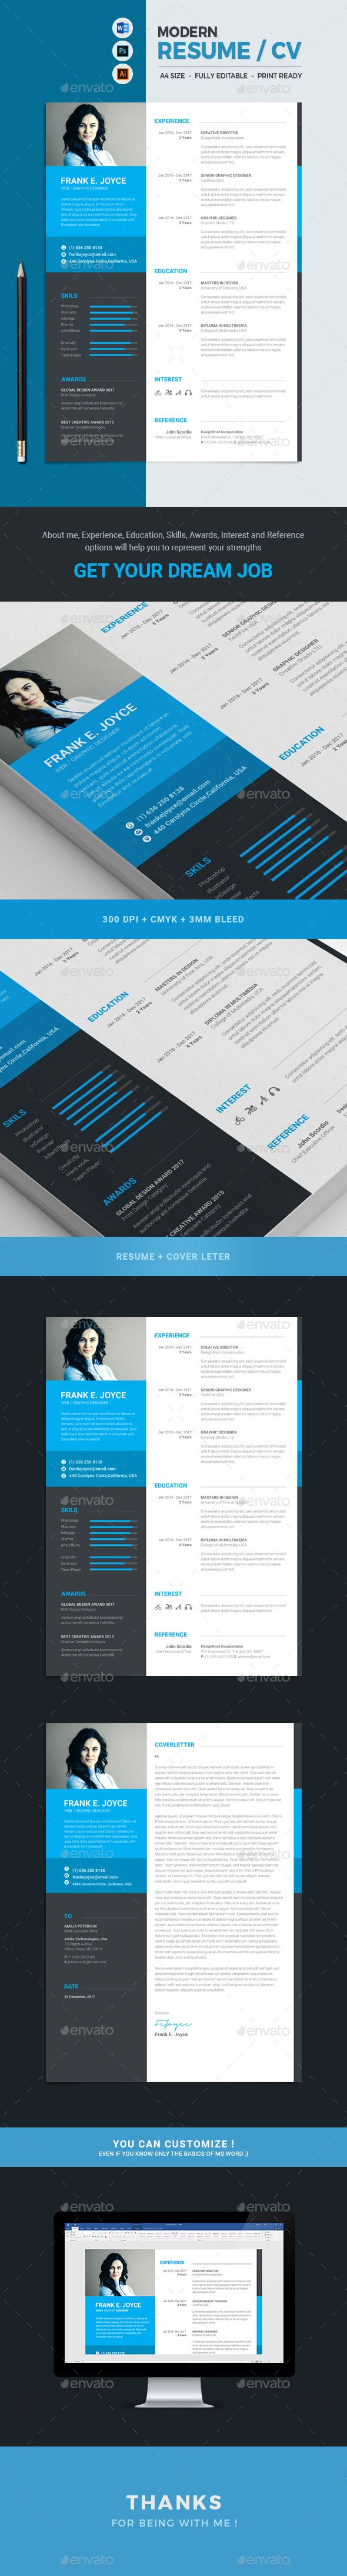 Company Letterhead Template 2 - TemplateLab Exclusive | Education ...